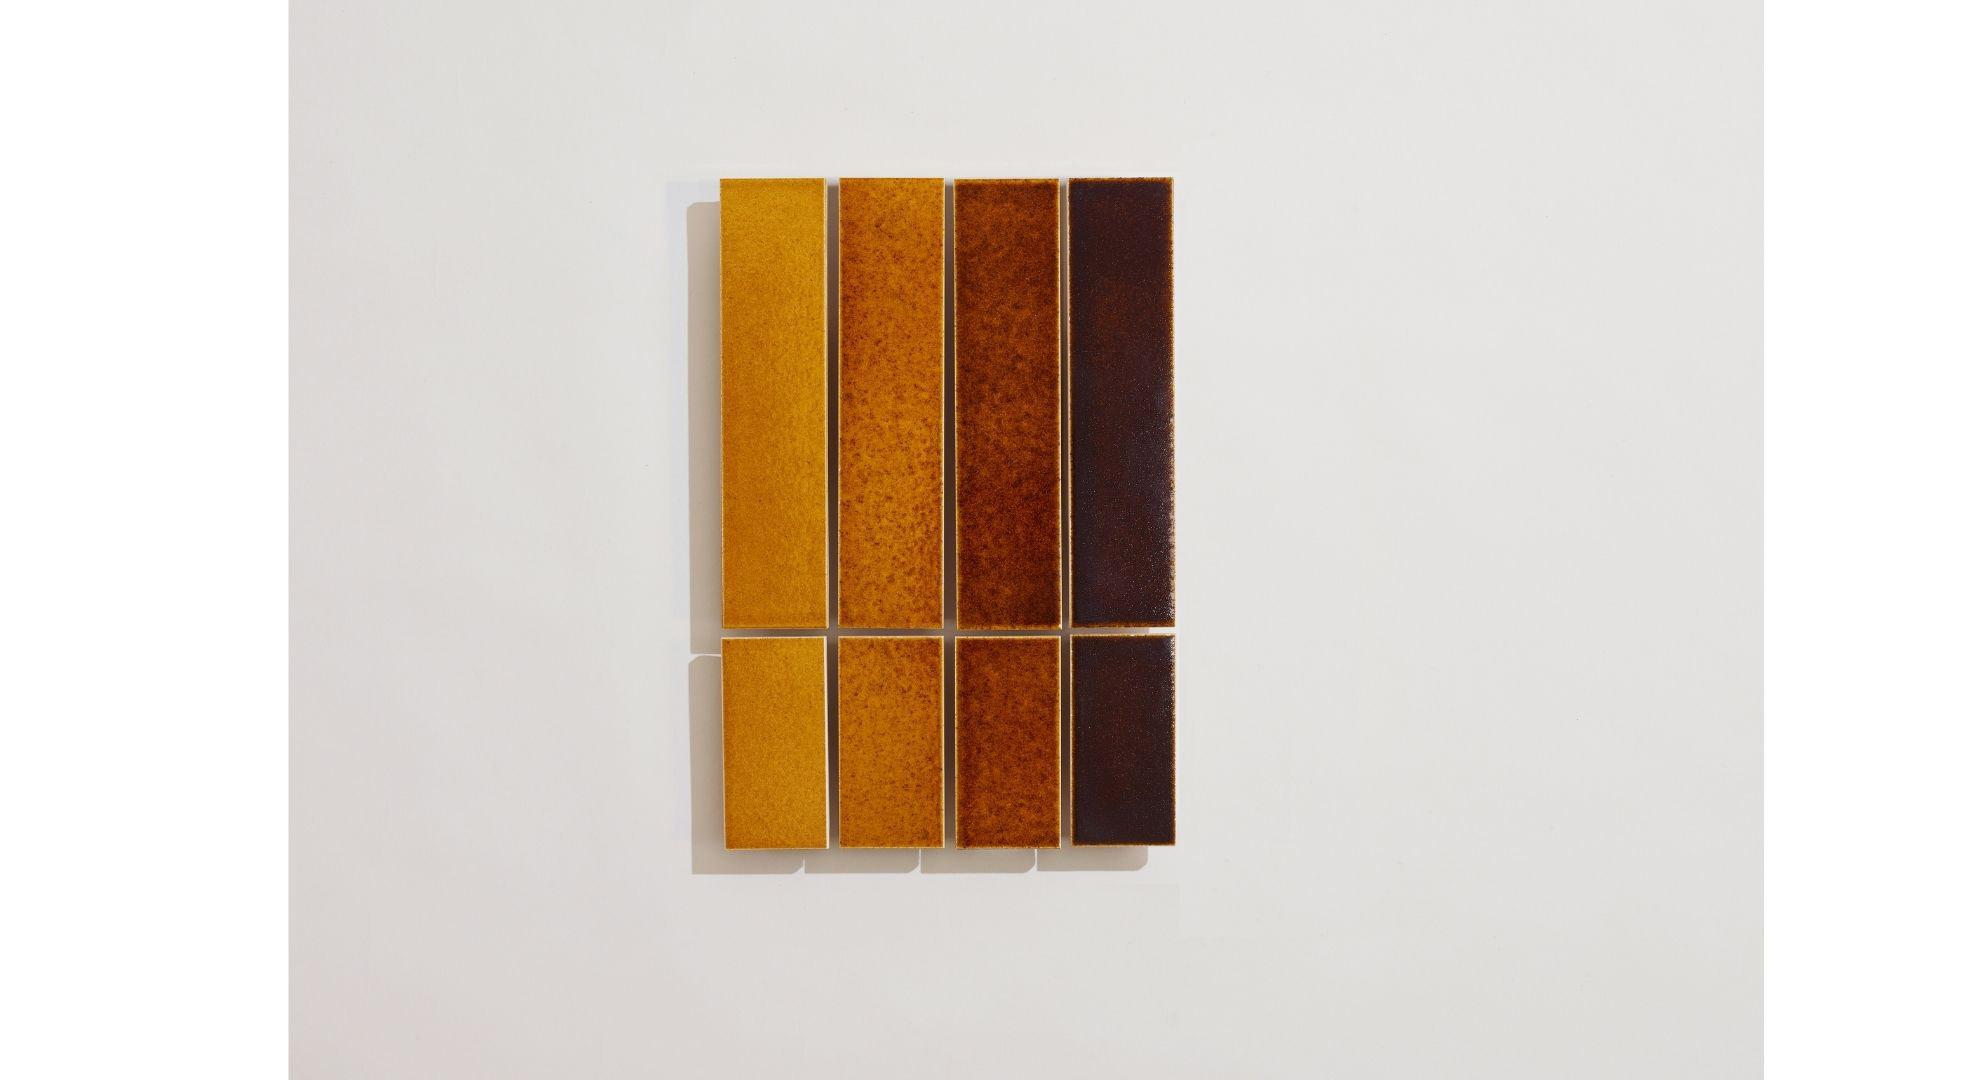 Design and tonal variation in glazed tiles.